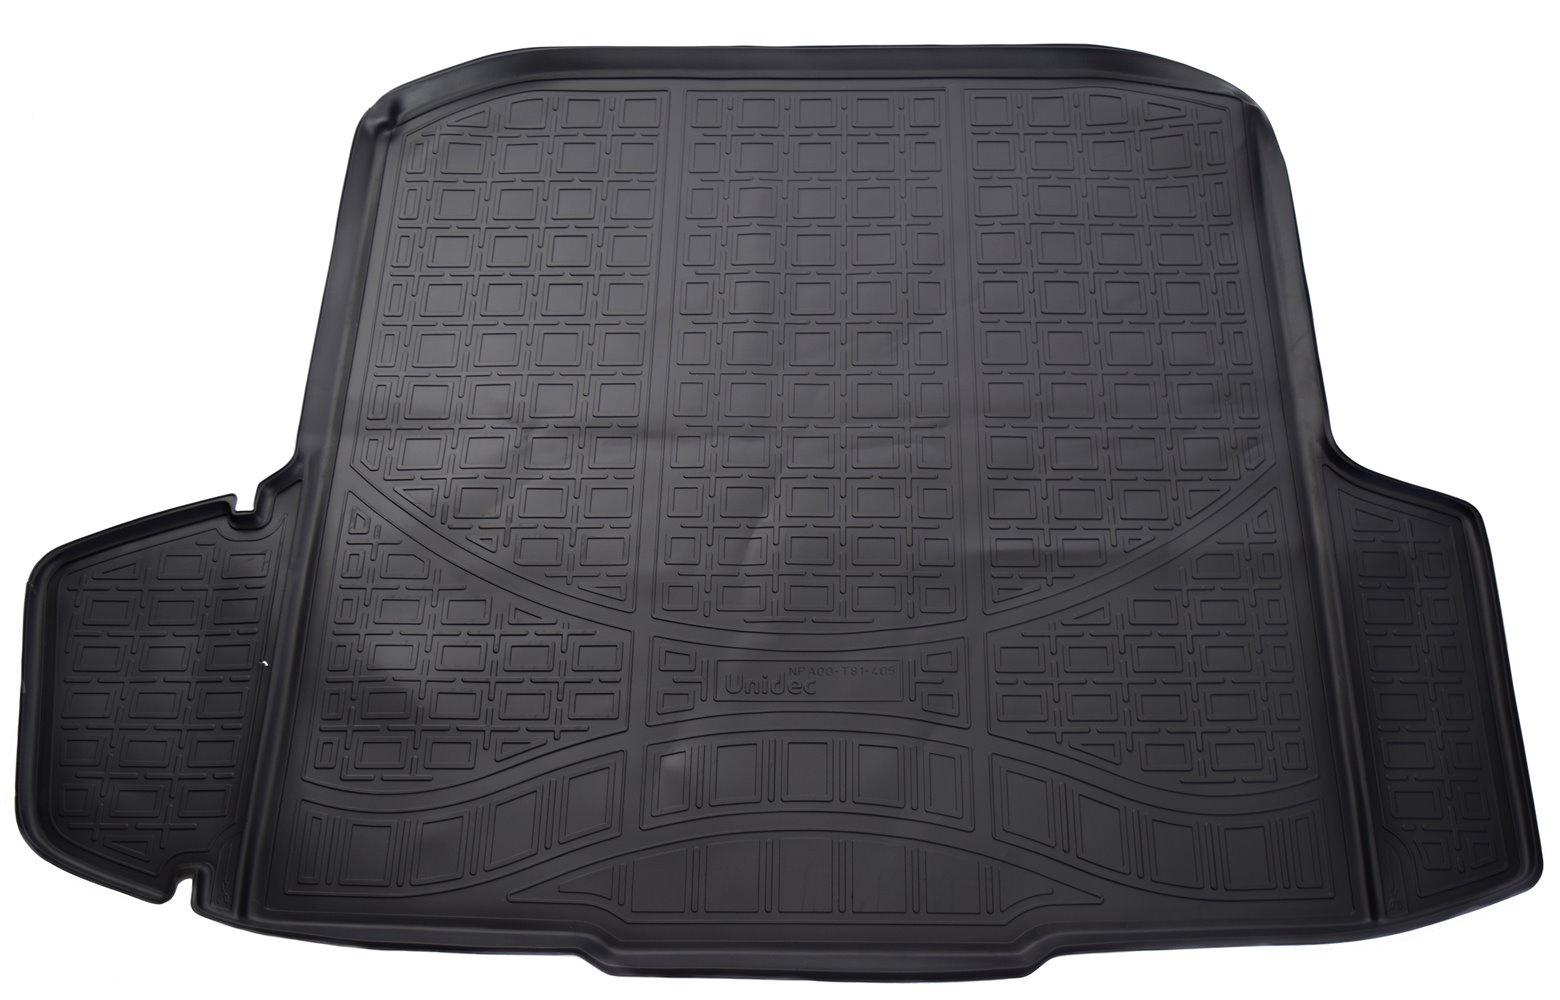 Коврик багажника для Skoda Octavia III (A7) (Combi) (2013) комплект ковриков салона и багажника rival для skoda octavia a7 2013 н в полиуретан k15101001 4